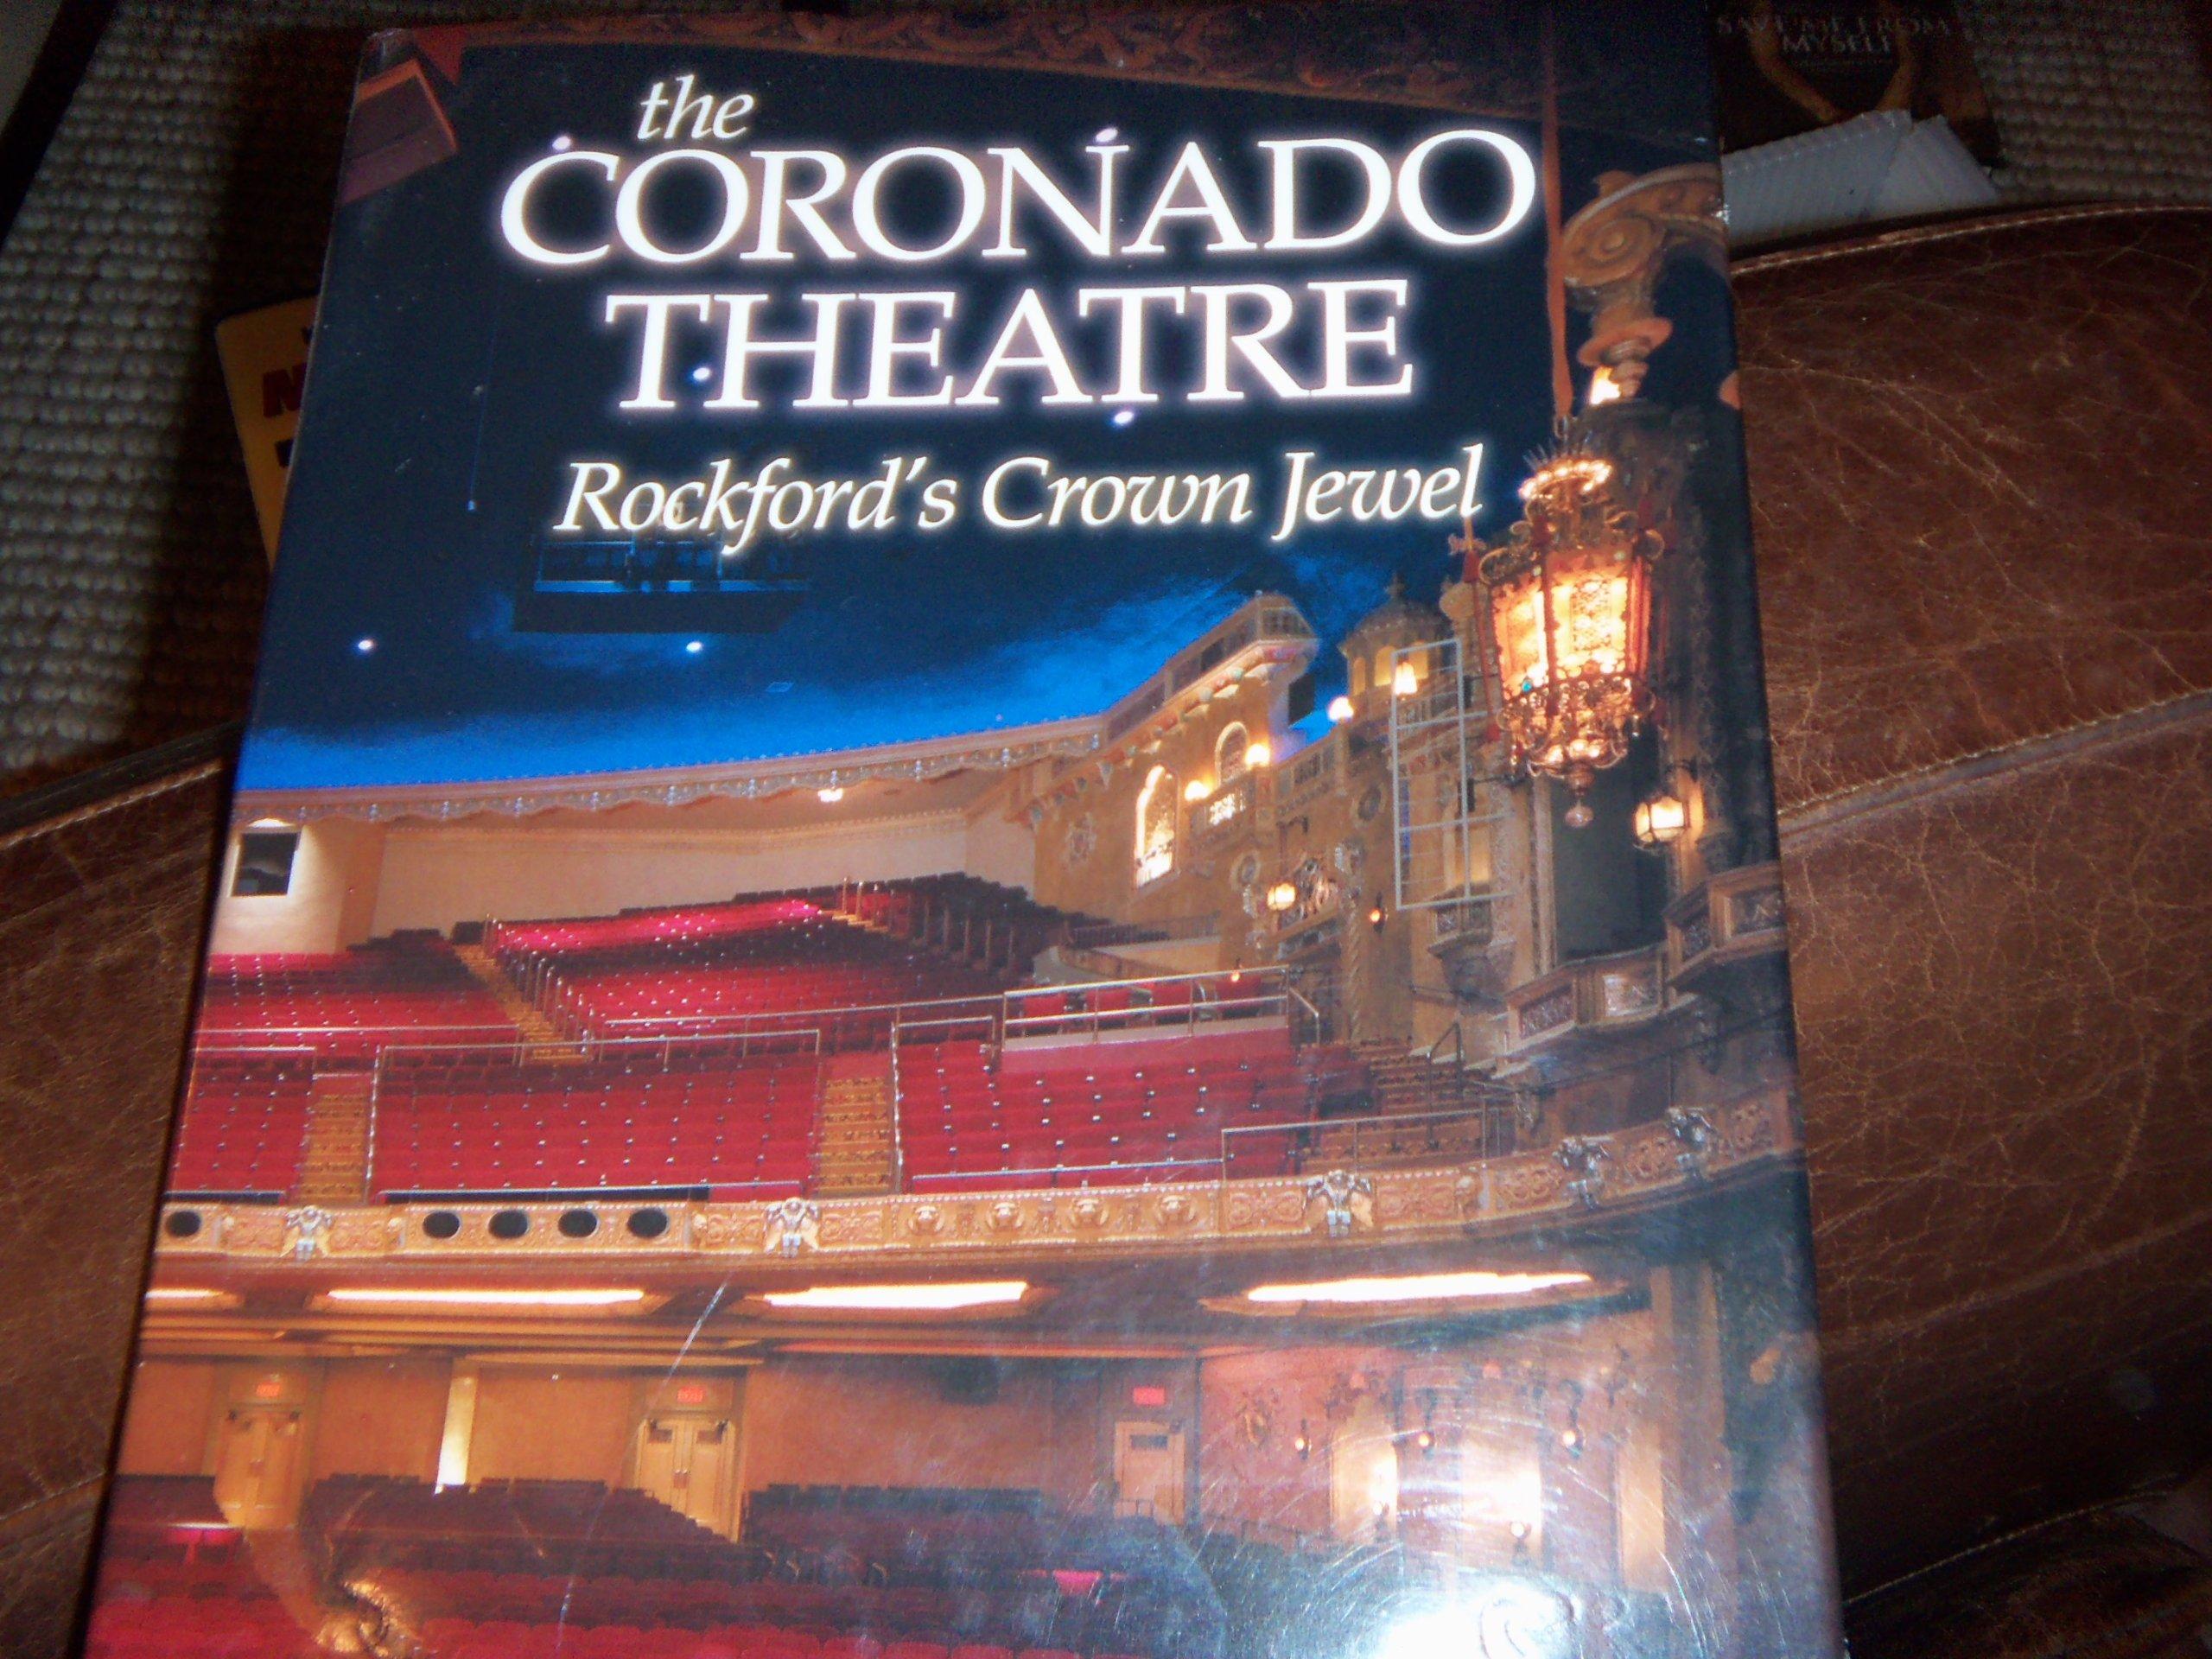 Download The Coronado Theatre: Rockford's Crown Jewel pdf